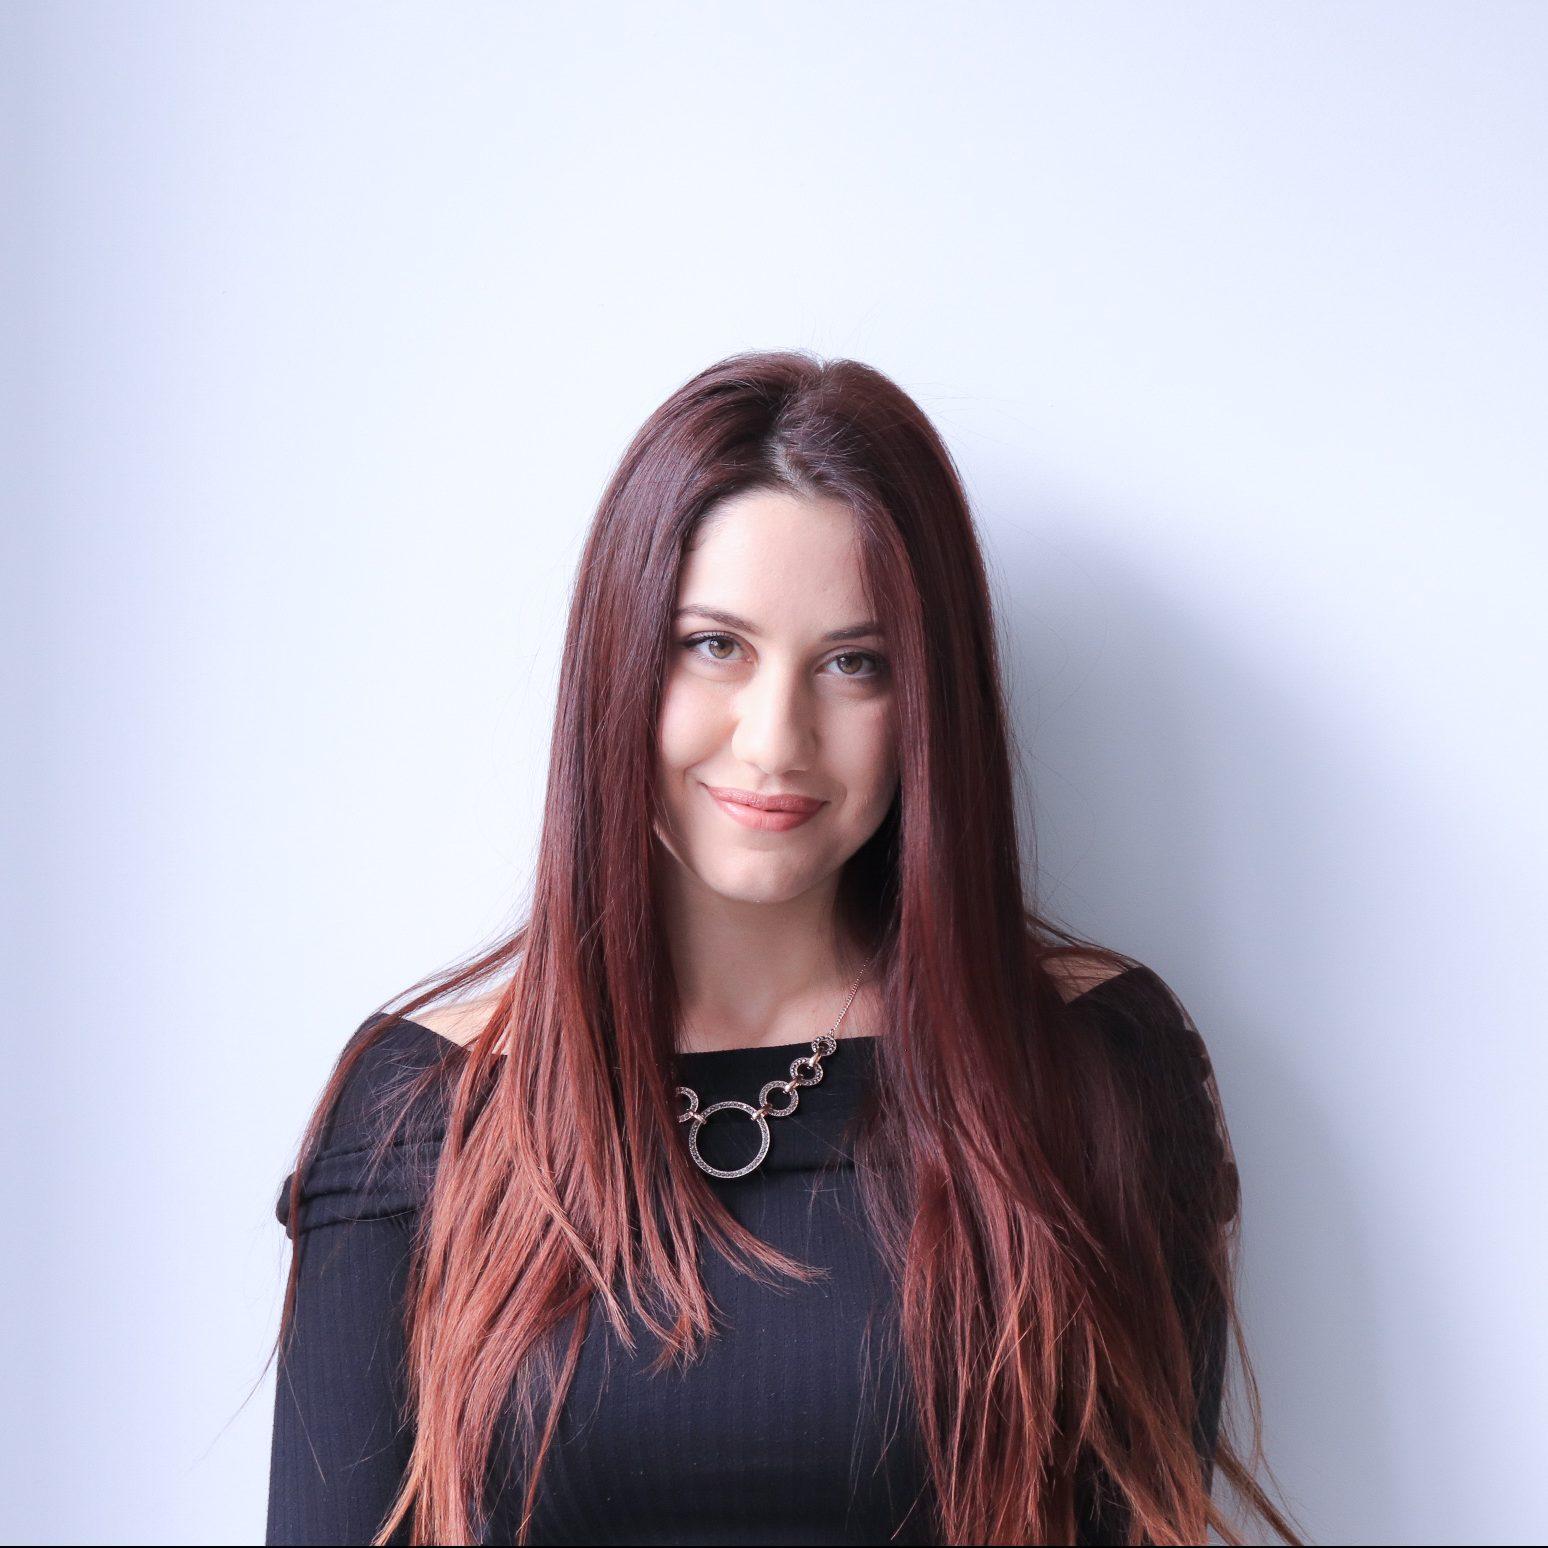 Angelica Tziotis